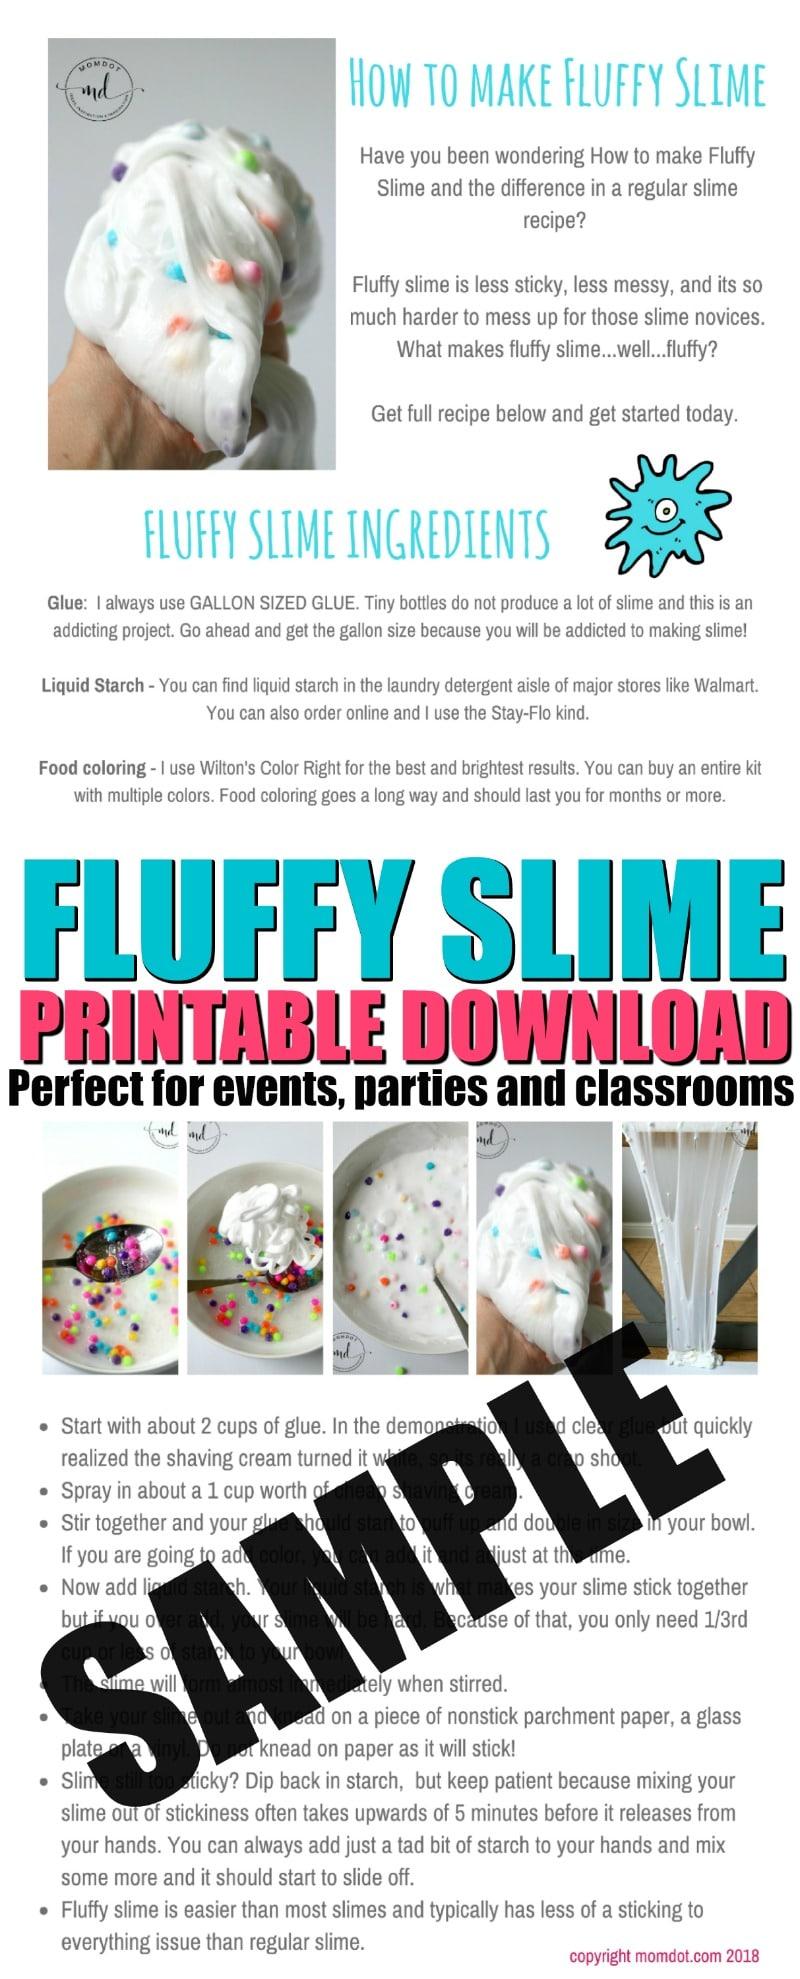 Fluffy Slime Free Printable